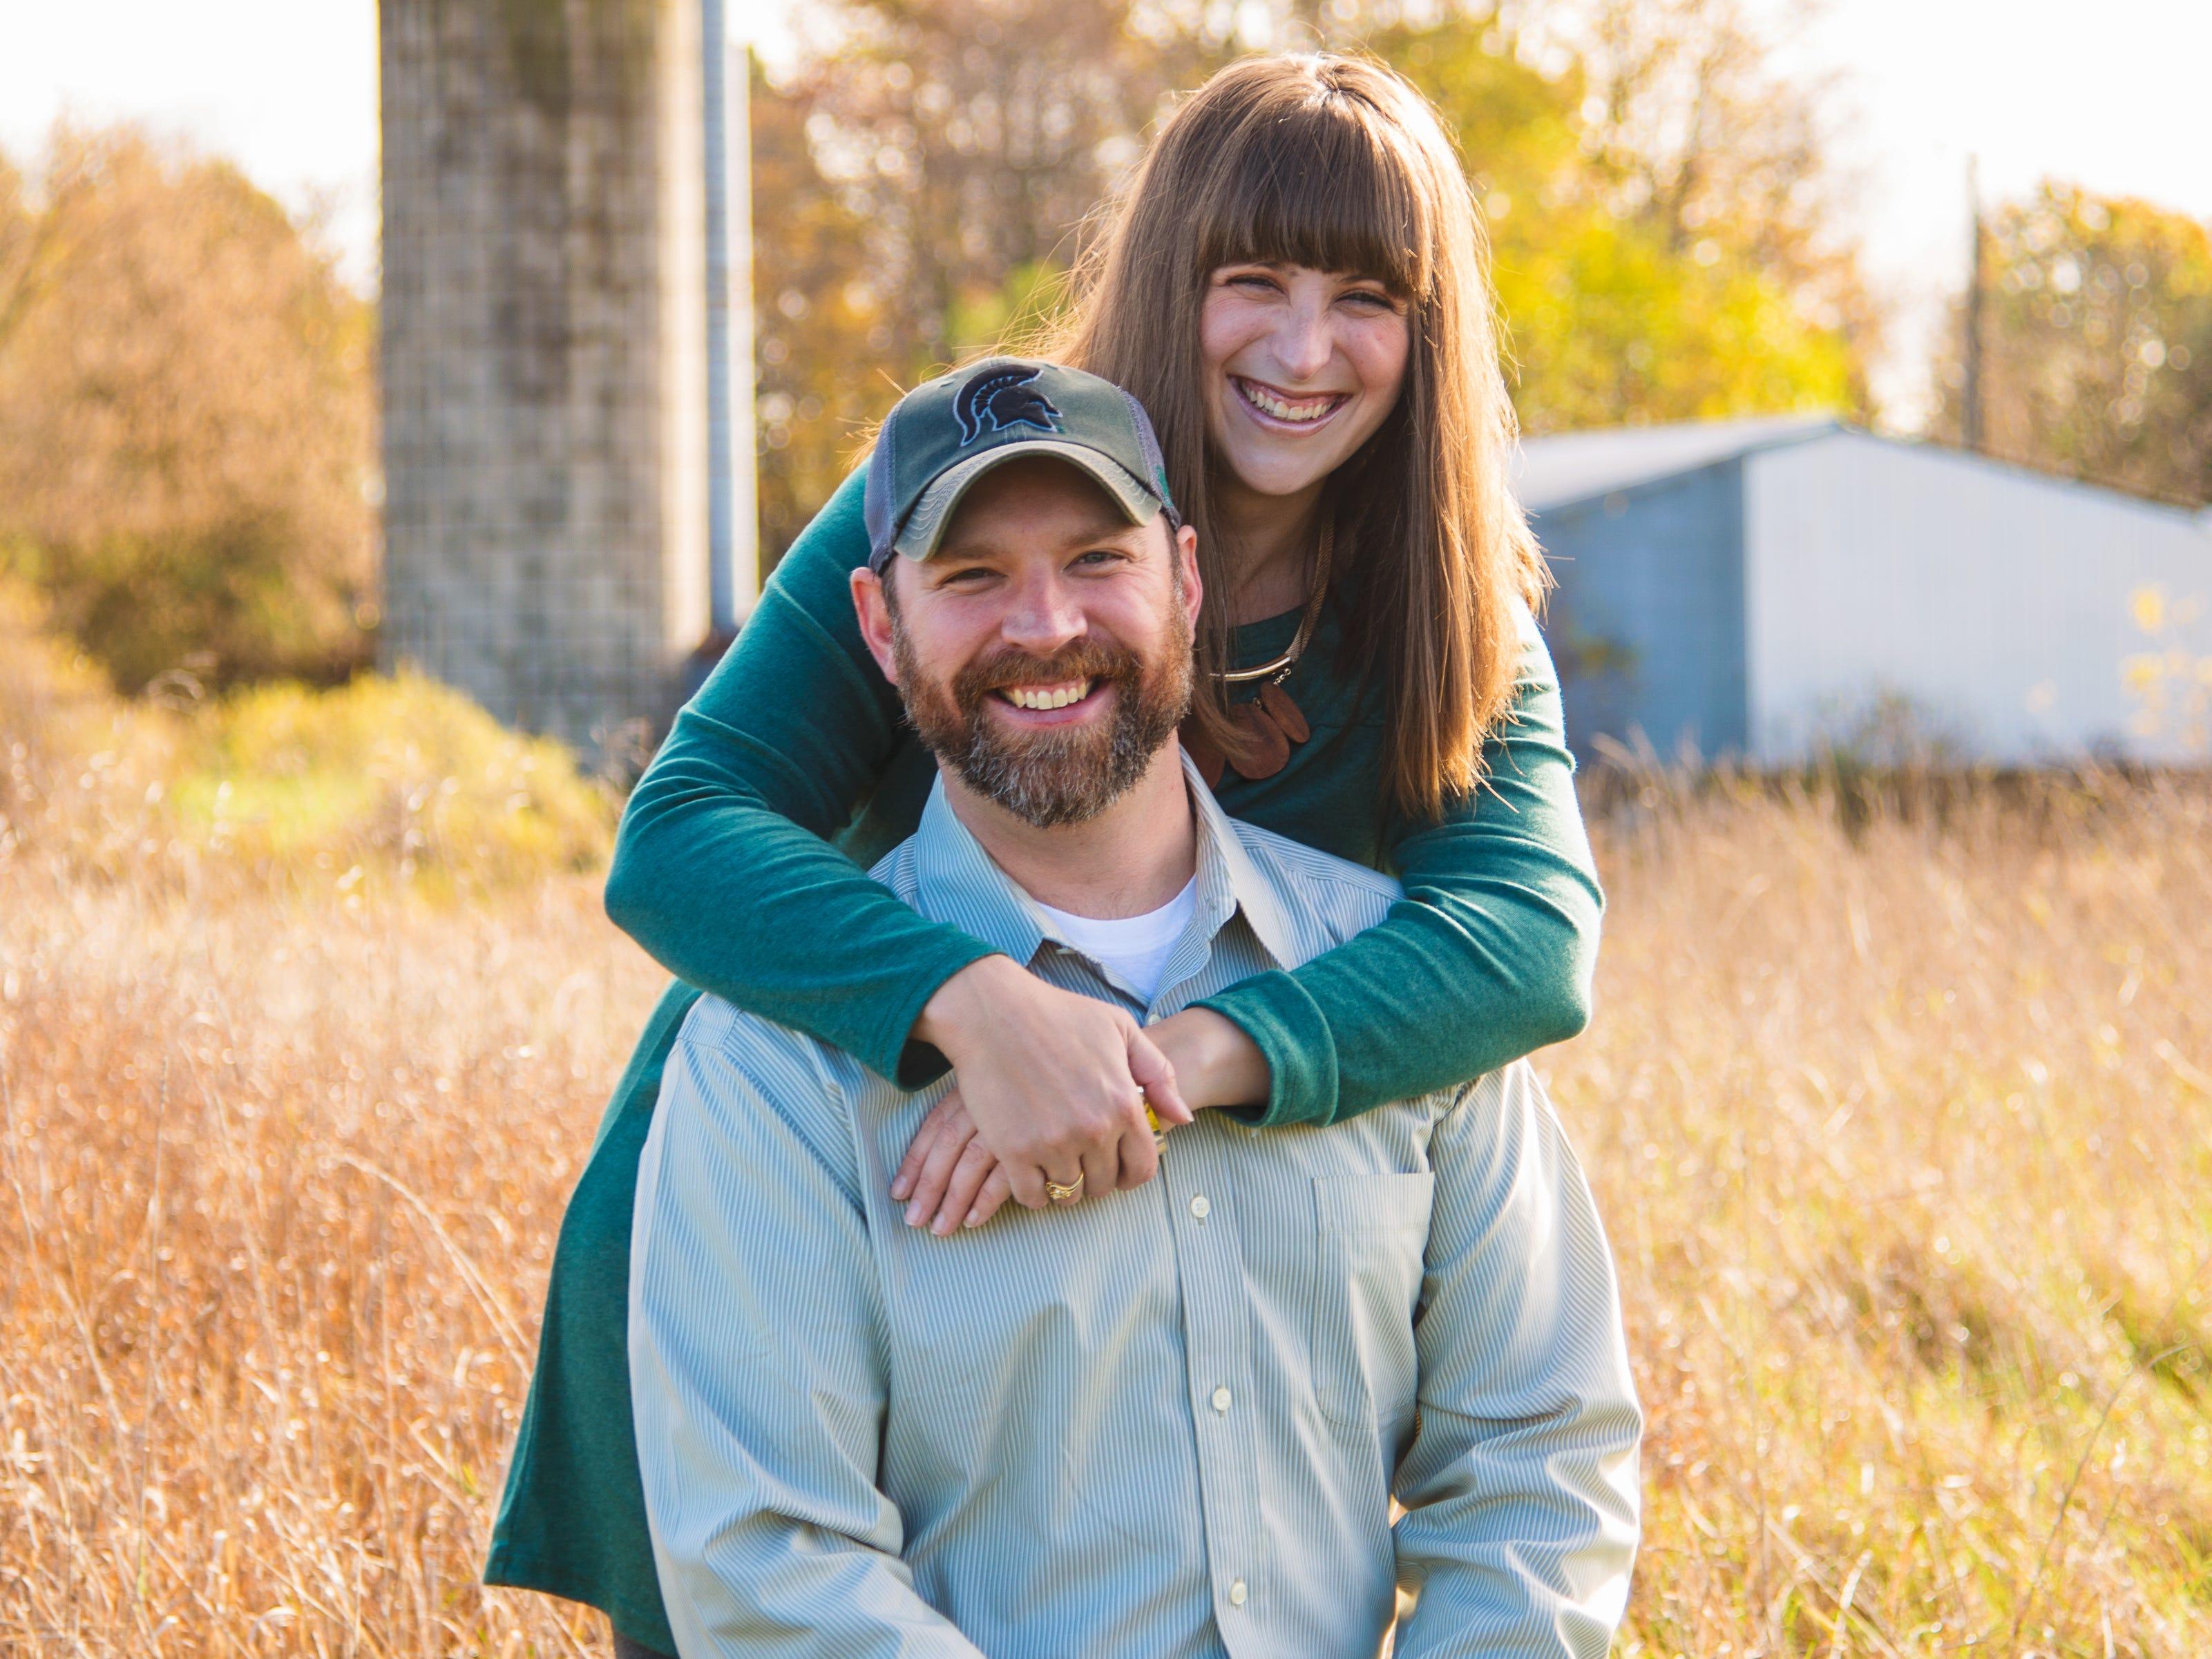 Meijer: Pharmacist who denied miscarriage drug no longer an employee